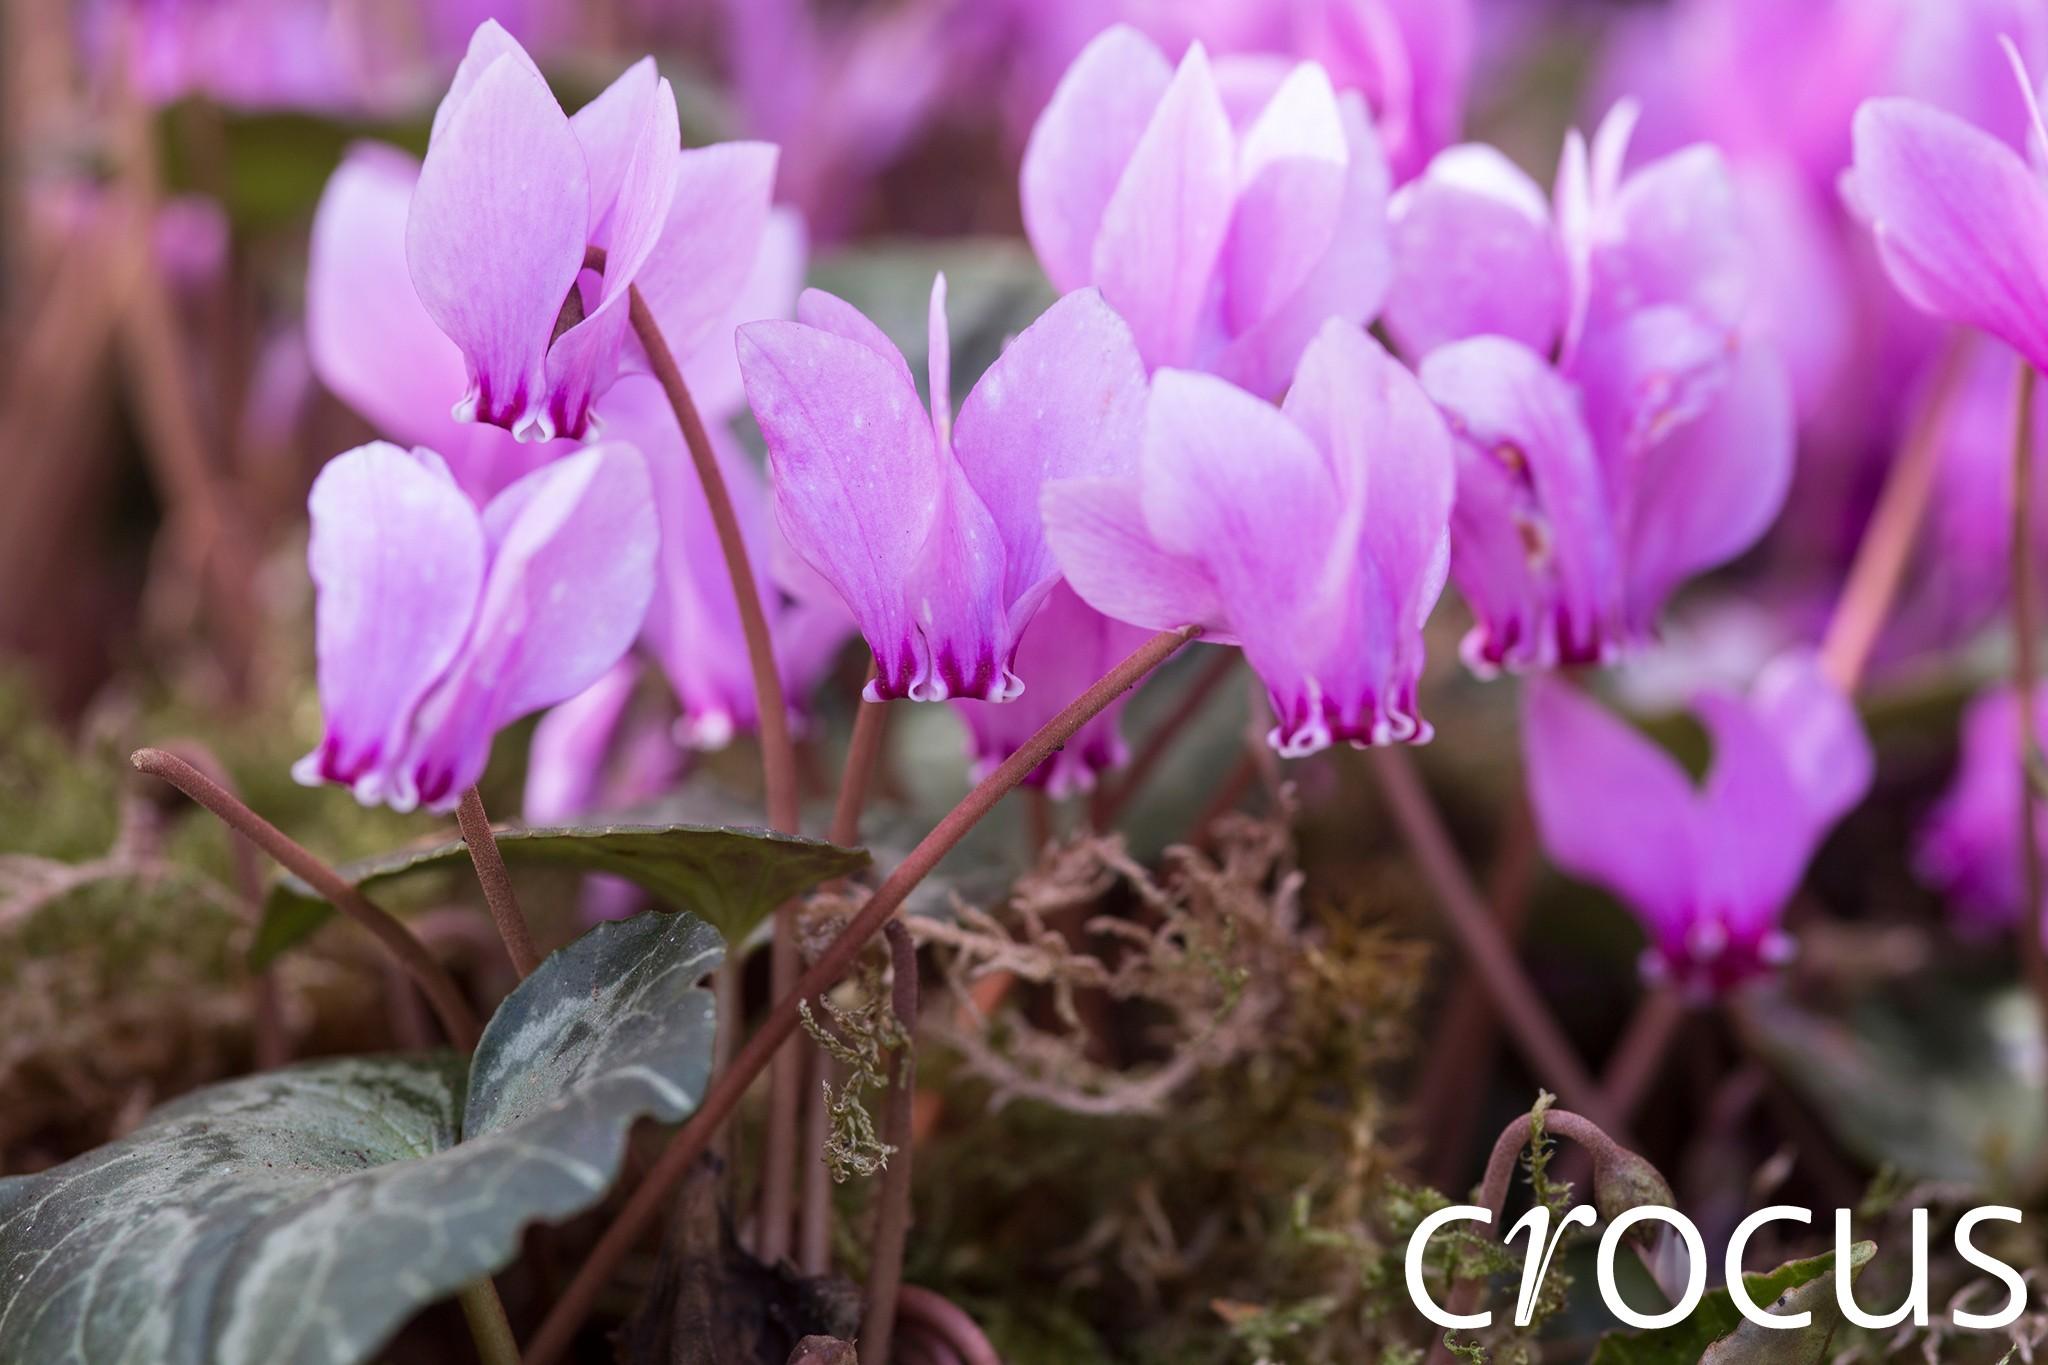 crocus-hero-shot-cyclamen-2048-1365